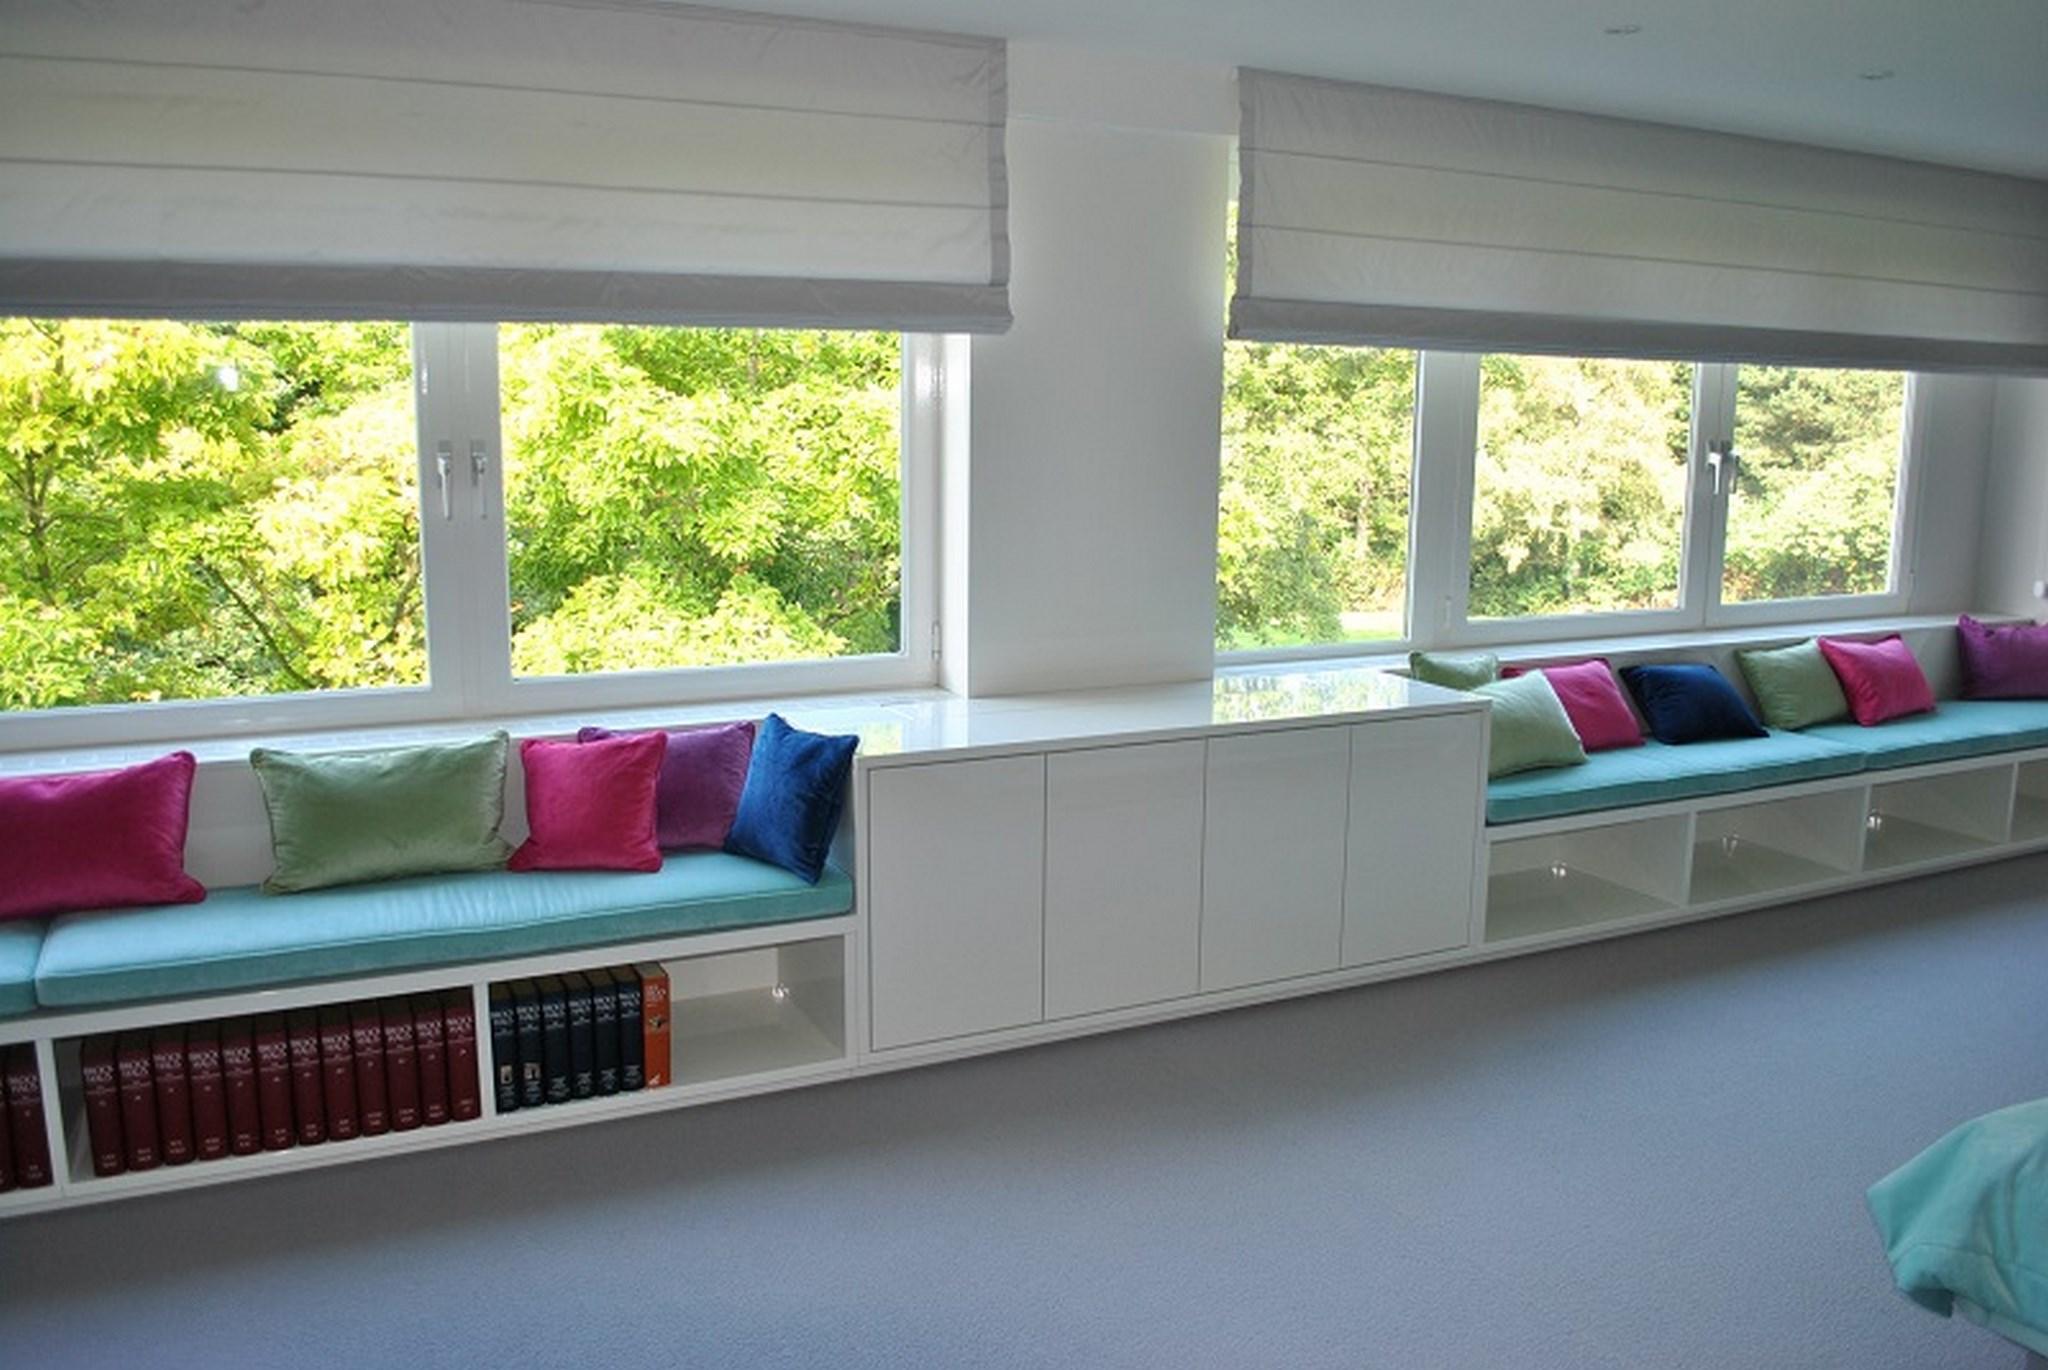 privakunden tischlerei van neuss gmbh. Black Bedroom Furniture Sets. Home Design Ideas